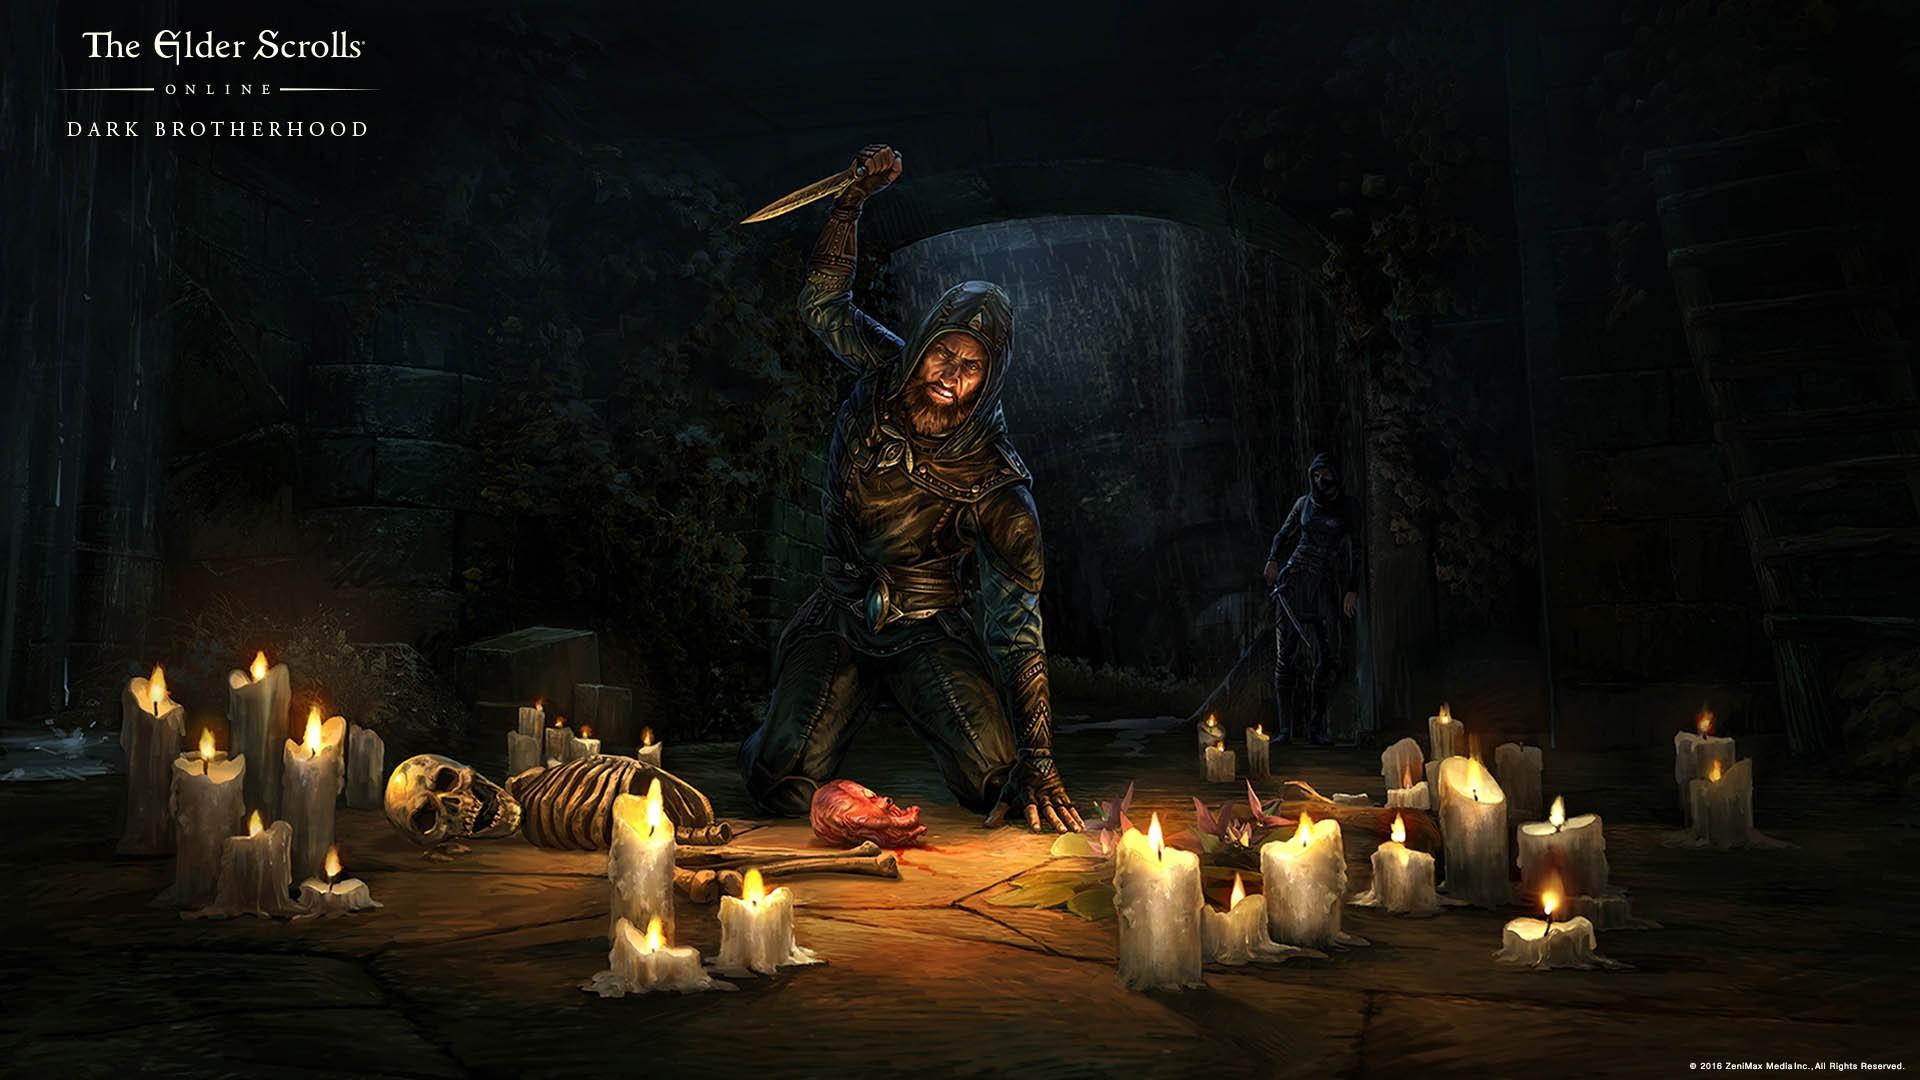 The Elder Scrolls Online Dlc Dark Brotherhood Gameplay